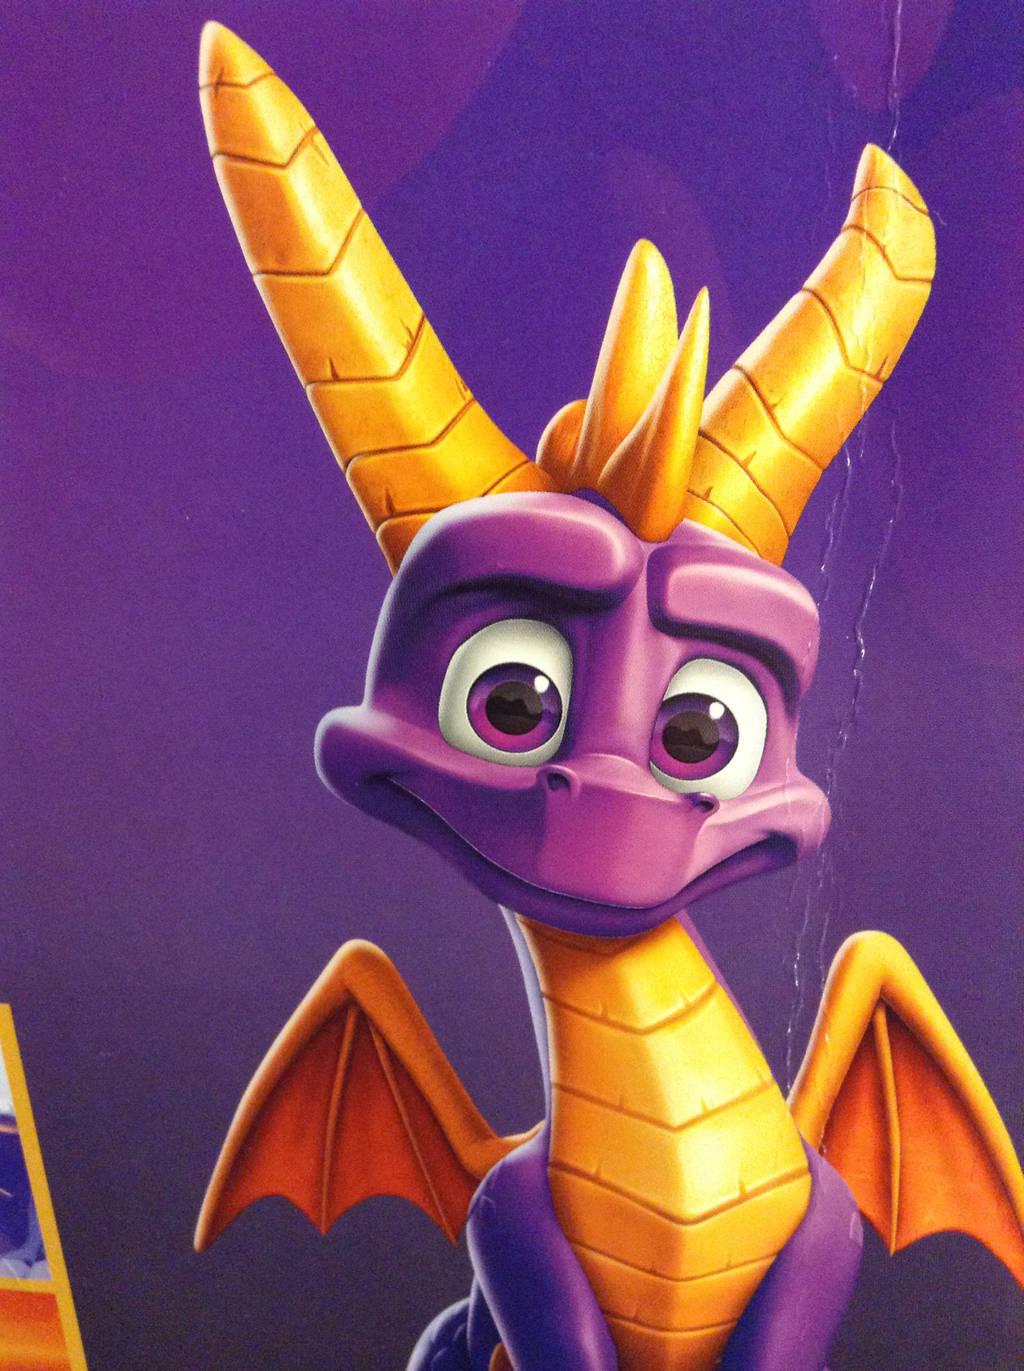 Spyro - Reignited Trilogy Promo Poster Box by DazzyADeviant